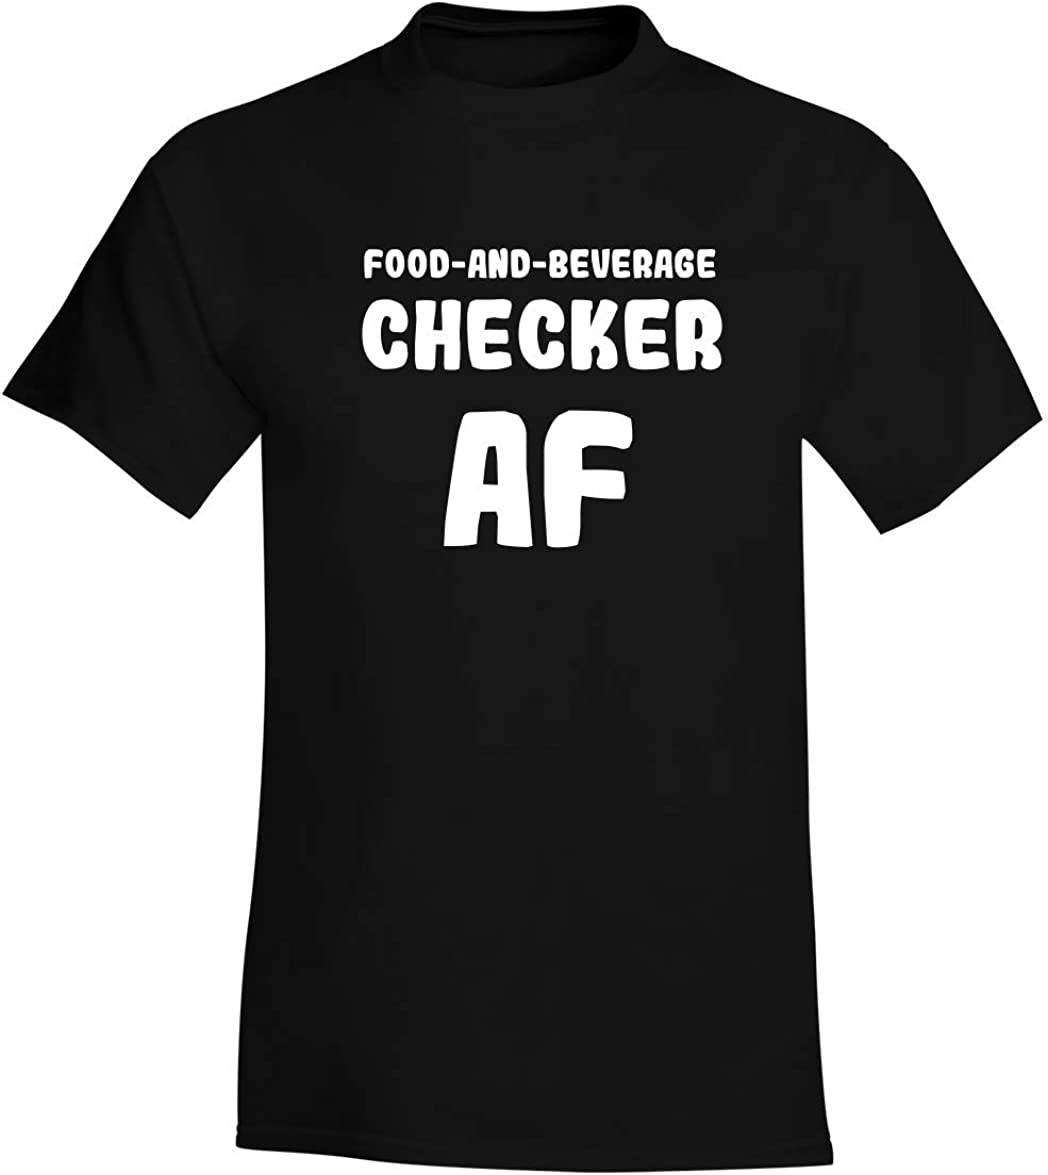 Food-And-Beverage Checker AF - A Soft & Comfortable Men's T-Shirt